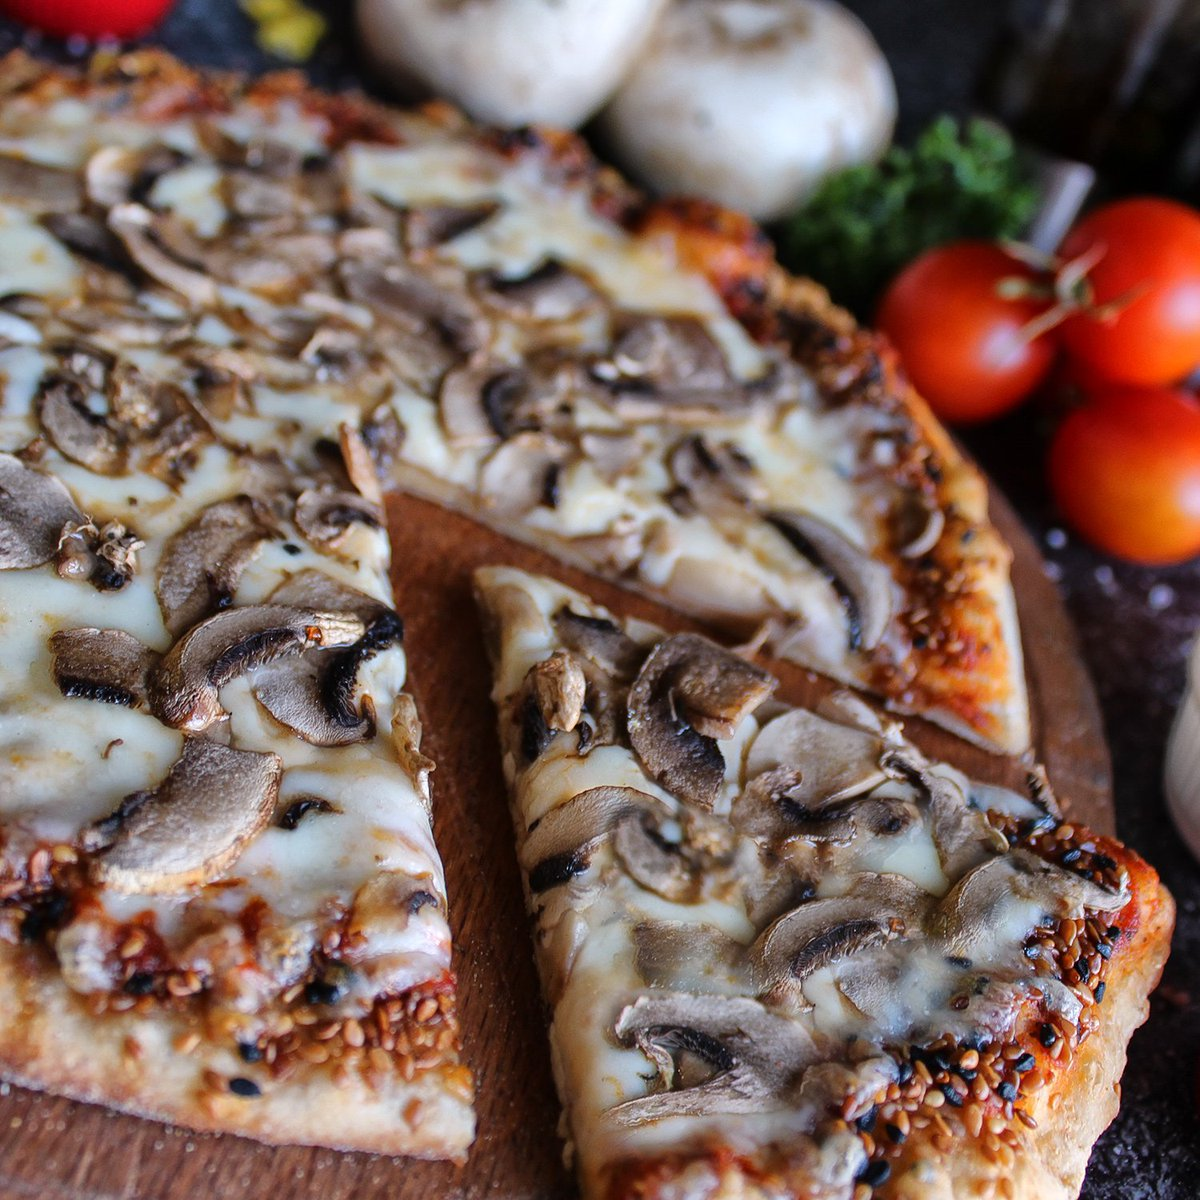 Pizza Palermo 2 Go On Twitter Bol Mozzarella Peyniri Ve Bol Mantar